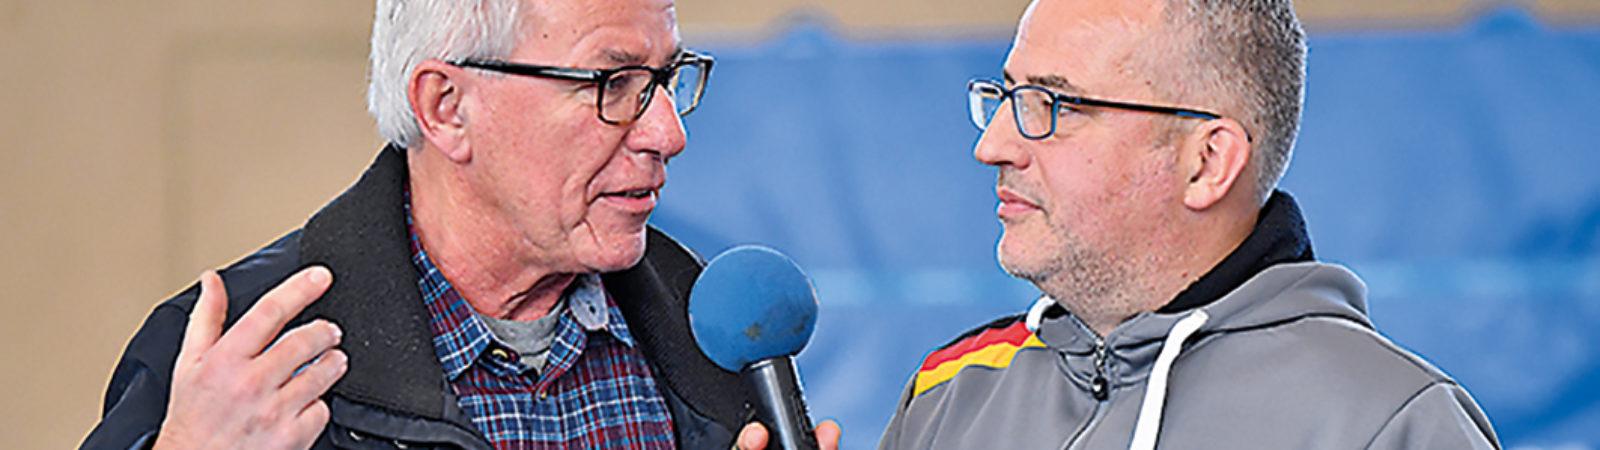 Joachim Sorgenfrey, Präsident des SC Poppenbüttel, im Gespräch mit unserem Sport-Redakteur Sebastian Conrad (l.)